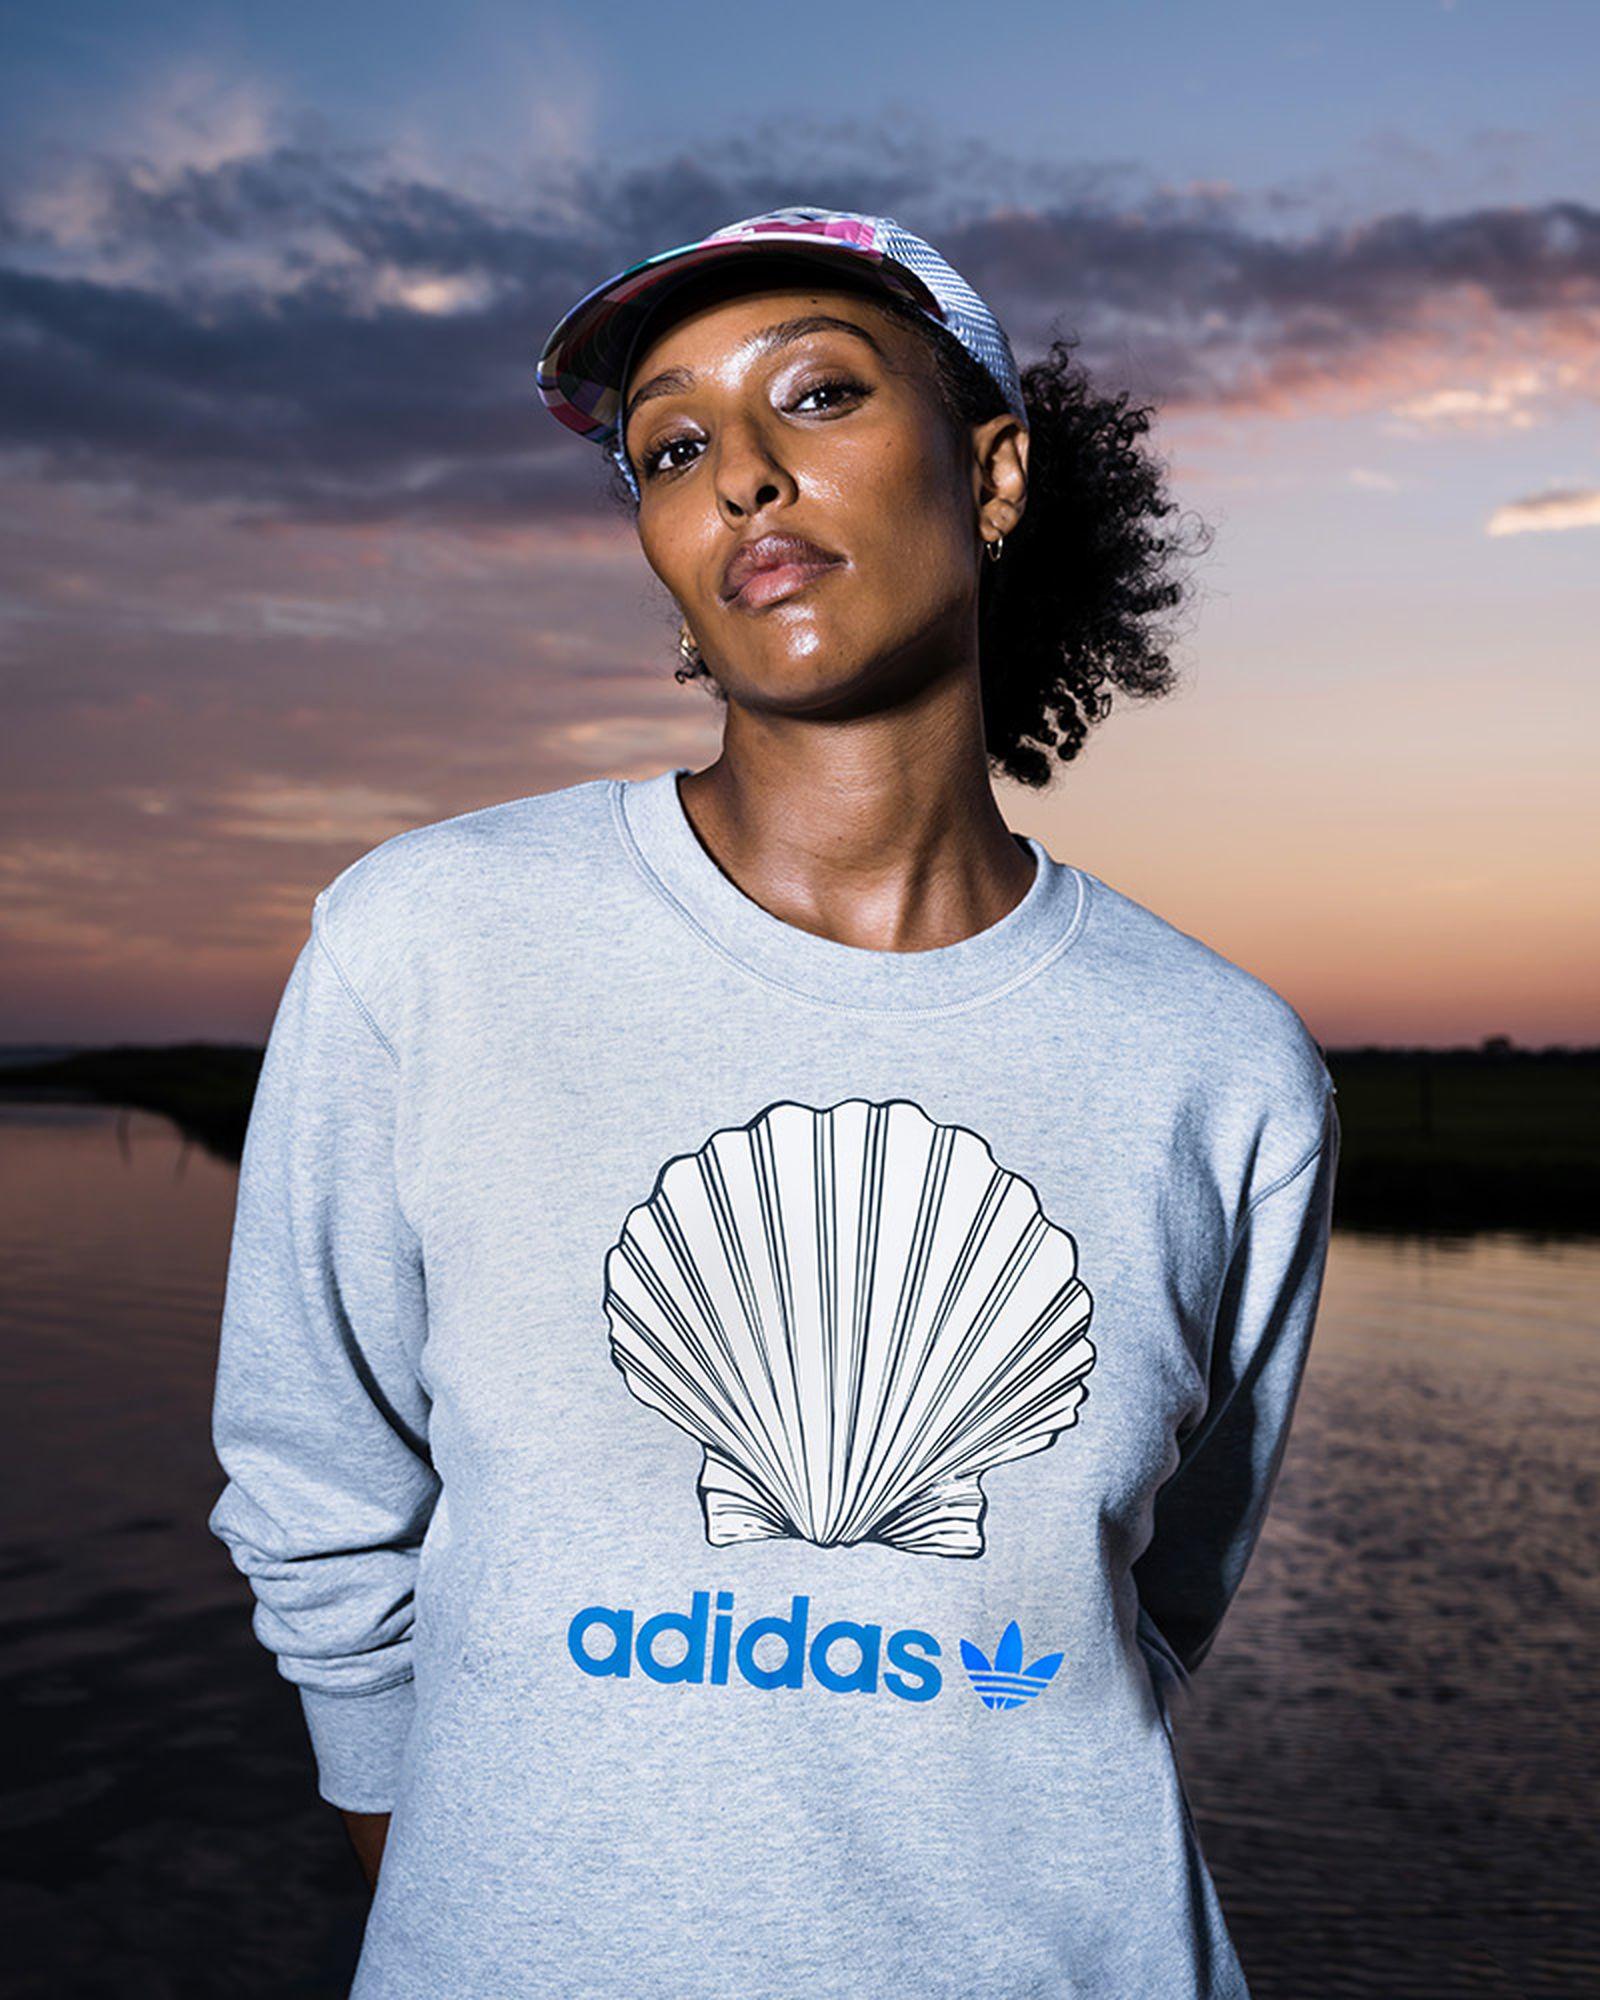 noah-adidas-fw20-collection-release-info-09